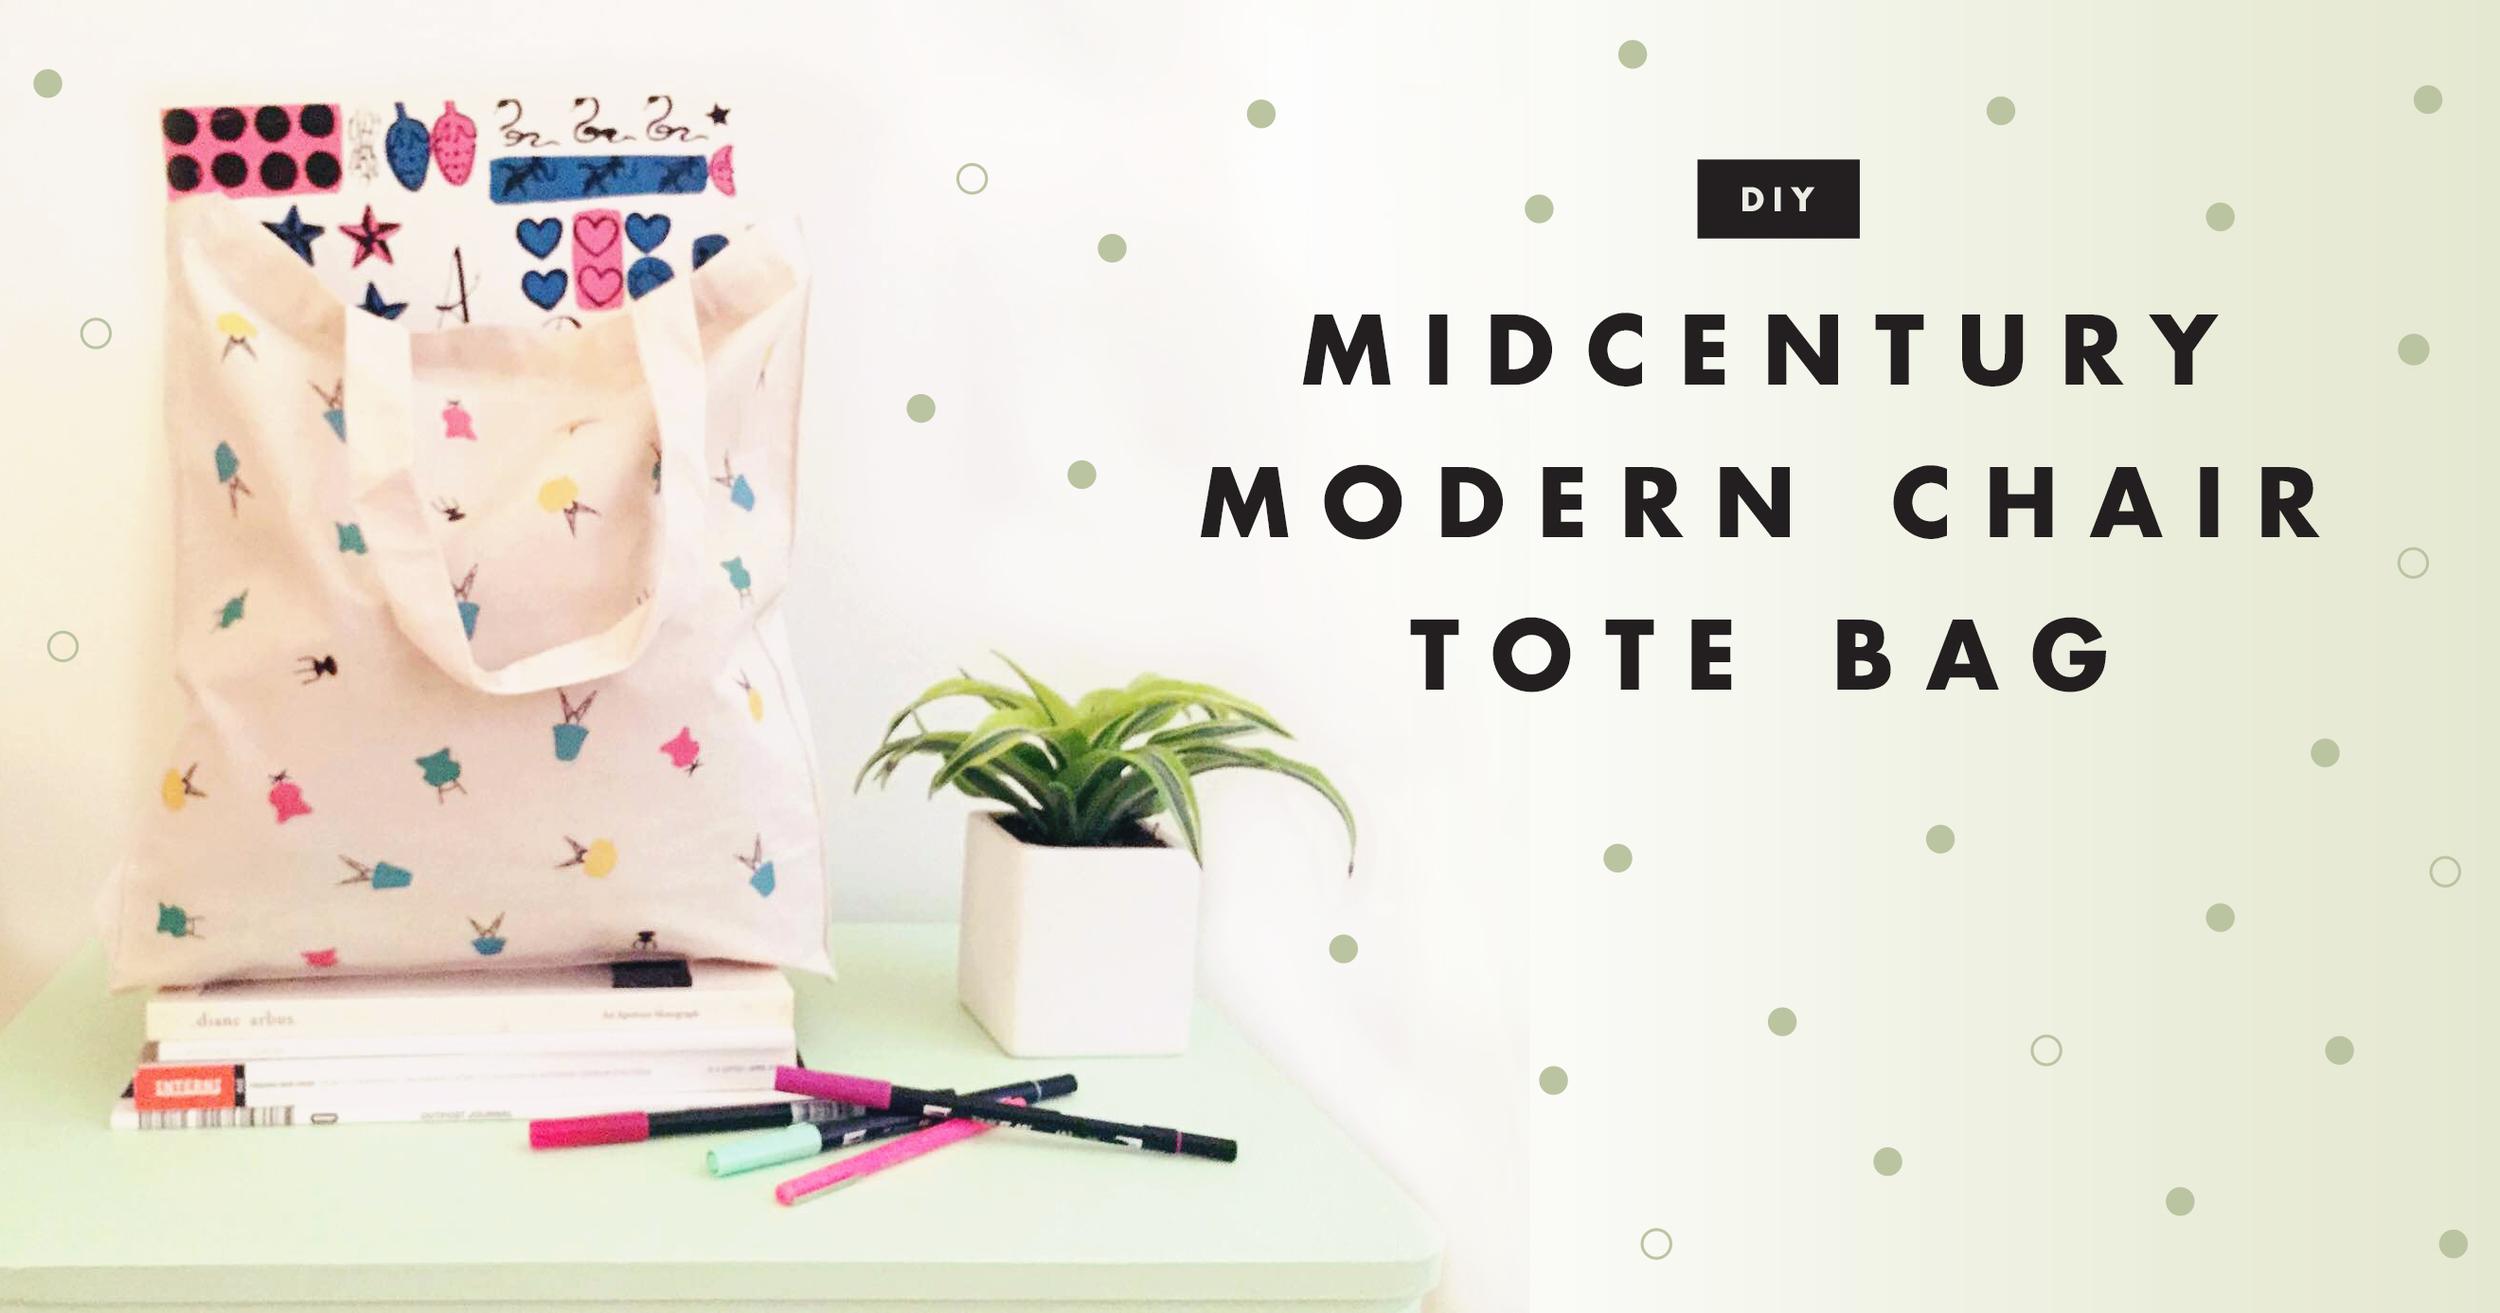 DIY MIdcentury Modern Chair Tote | Freckle & Fair